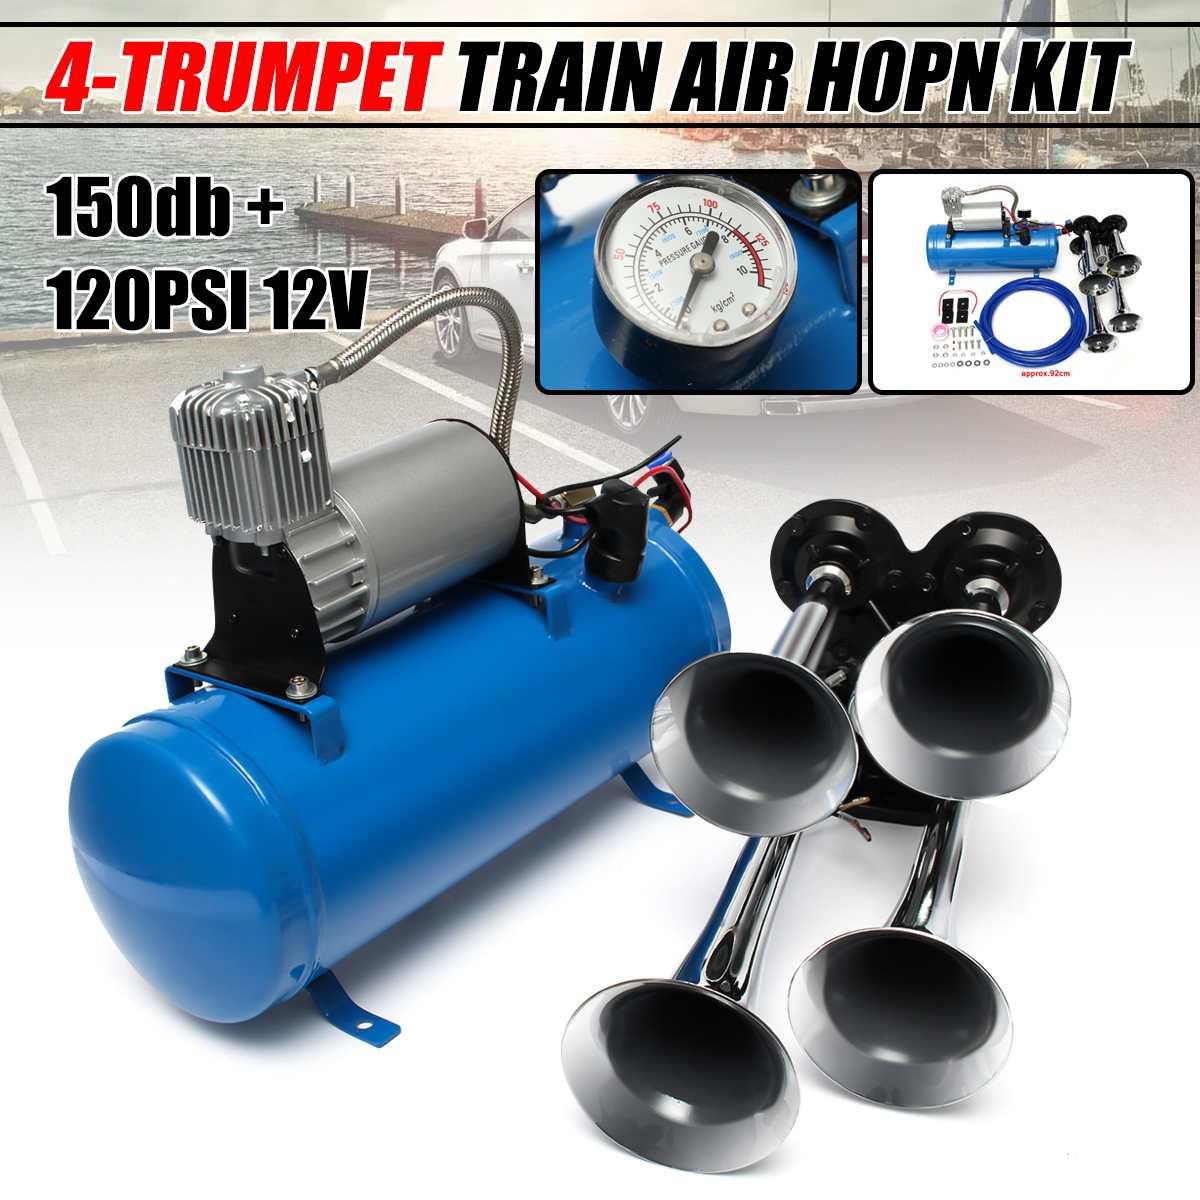 12 V/24 V 120 Psi 4 Air Trein Chrome Hoorn Trompet Voertuig Blauw Compressor Tubing 150dB